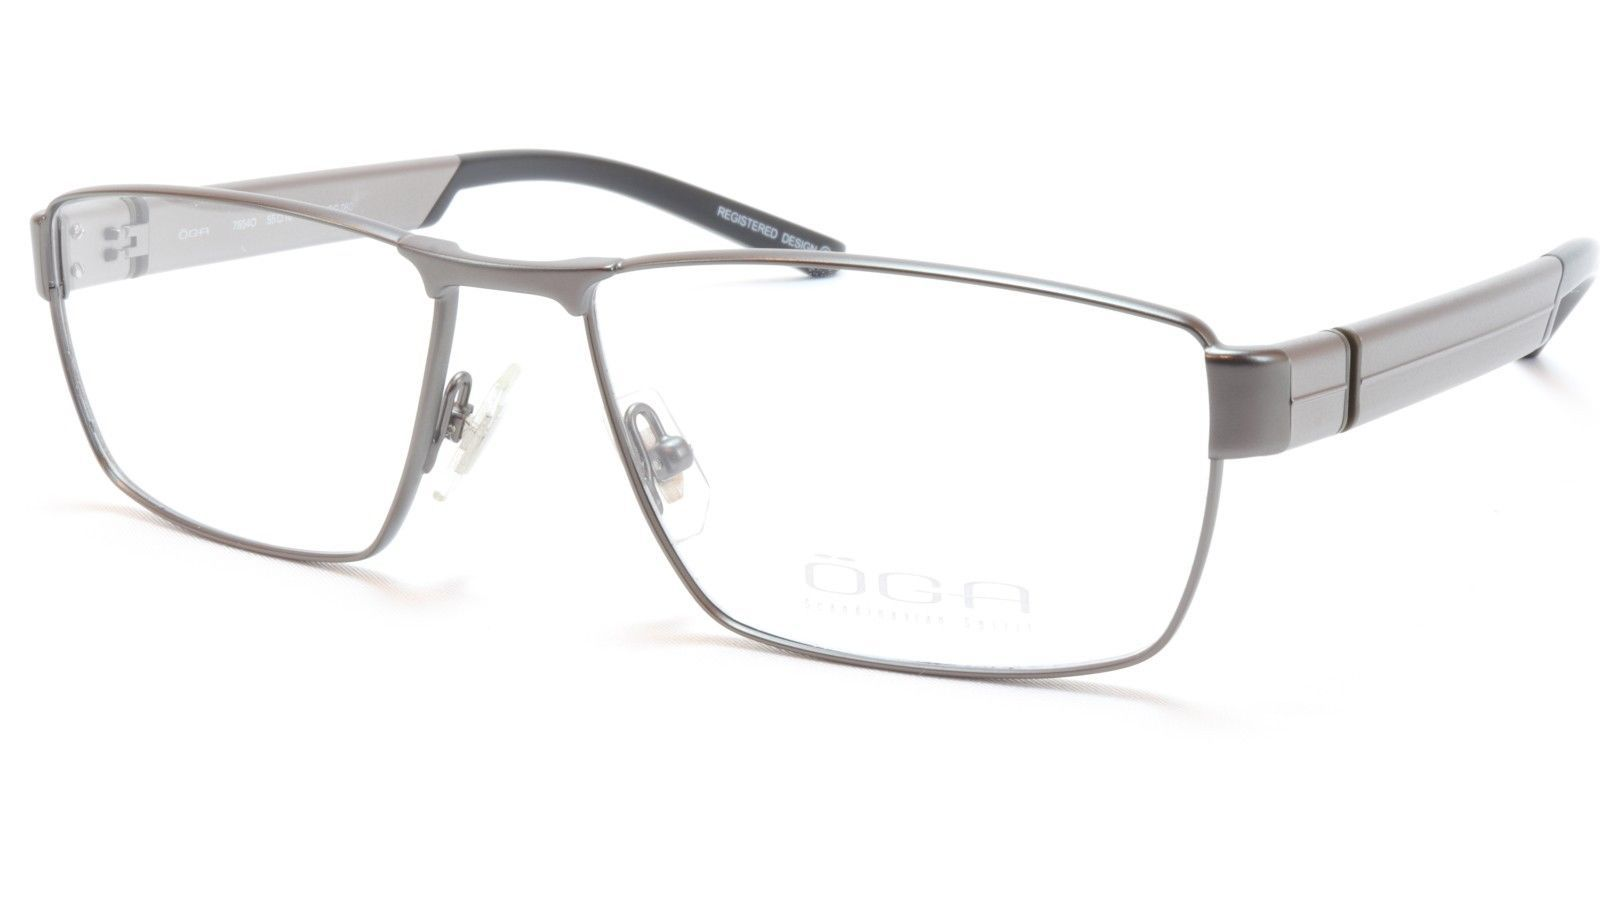 0b1b7cacff98 OGA Morel Eyeglasses Frame 76540 GG060 Metal and 50 similar items. 57